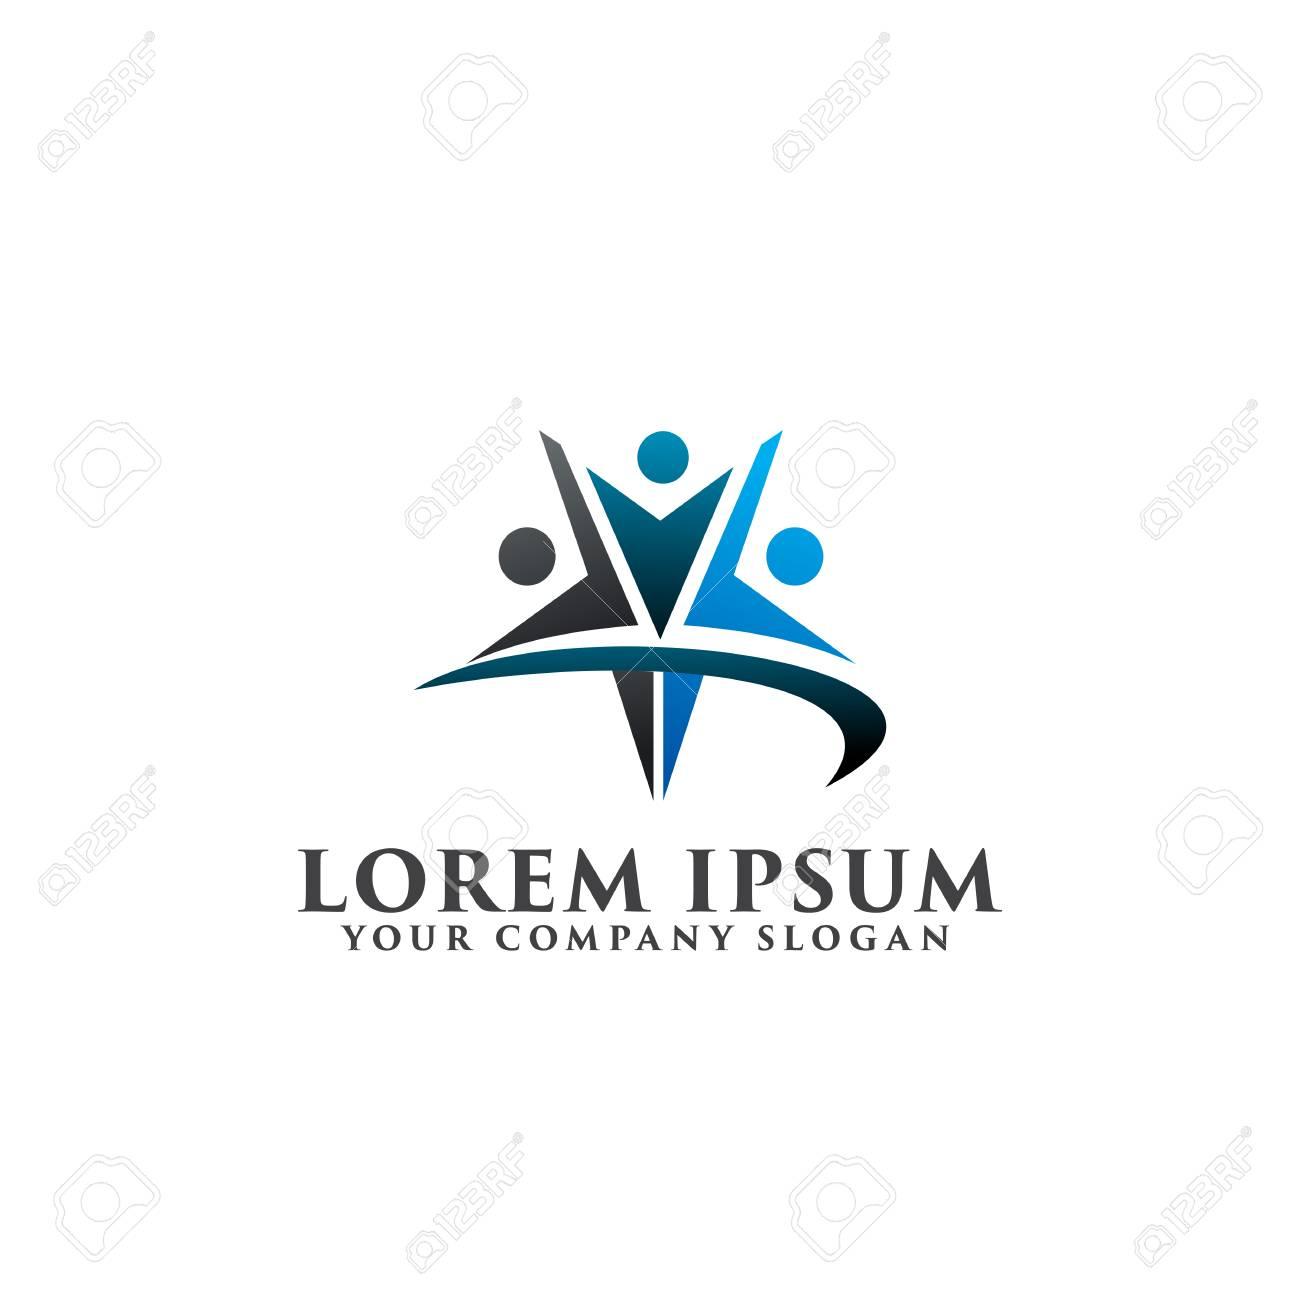 star people Logos. success people logo design concept template - 83305483